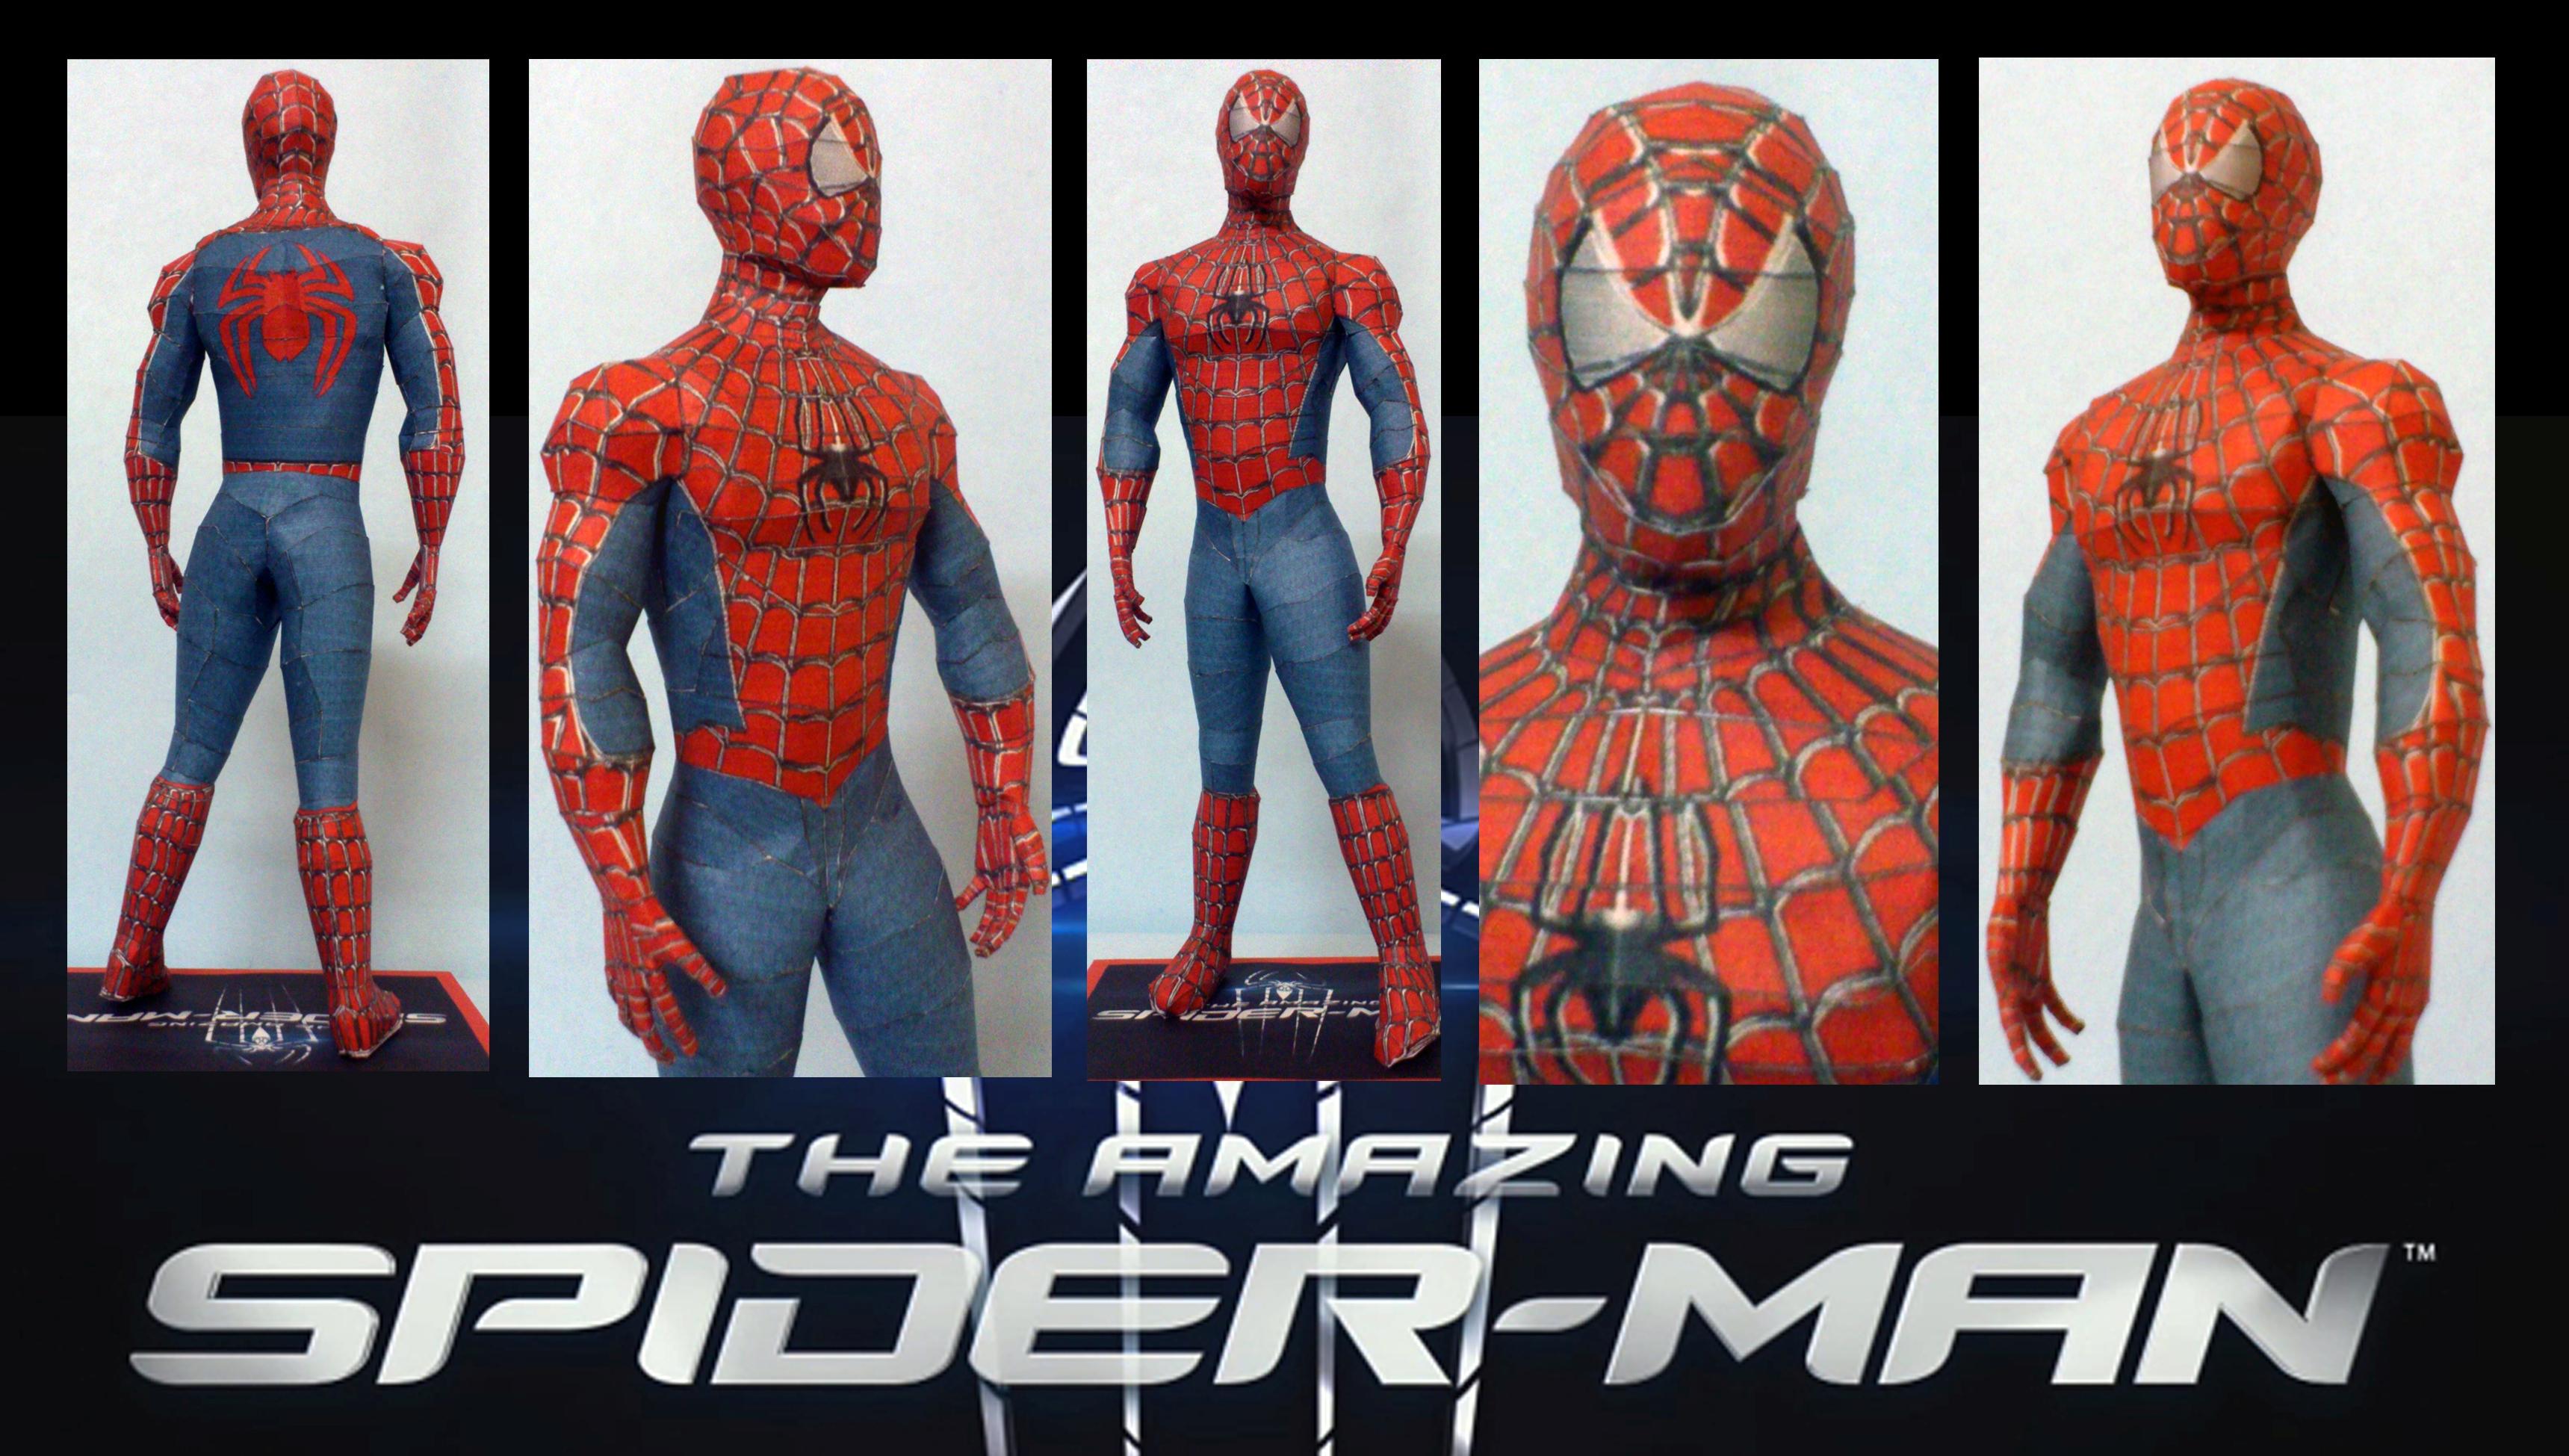 Spiderman Papercraft by suraj281191